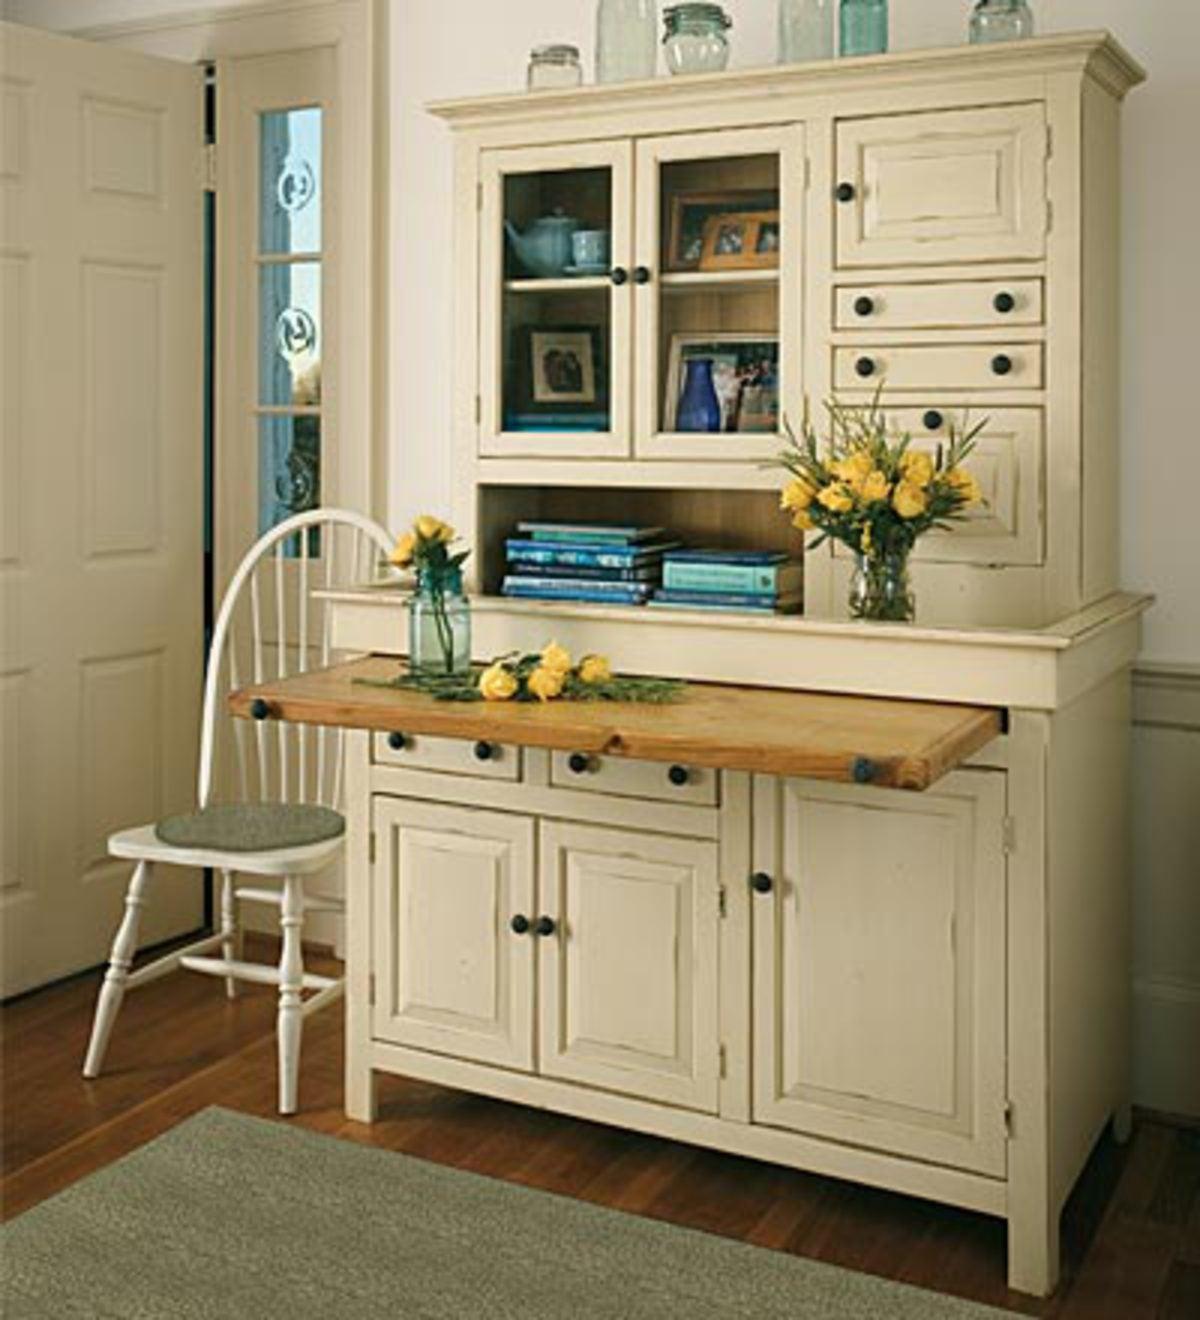 Conestoga Cabinets Reviews | Cabinets Matttroy